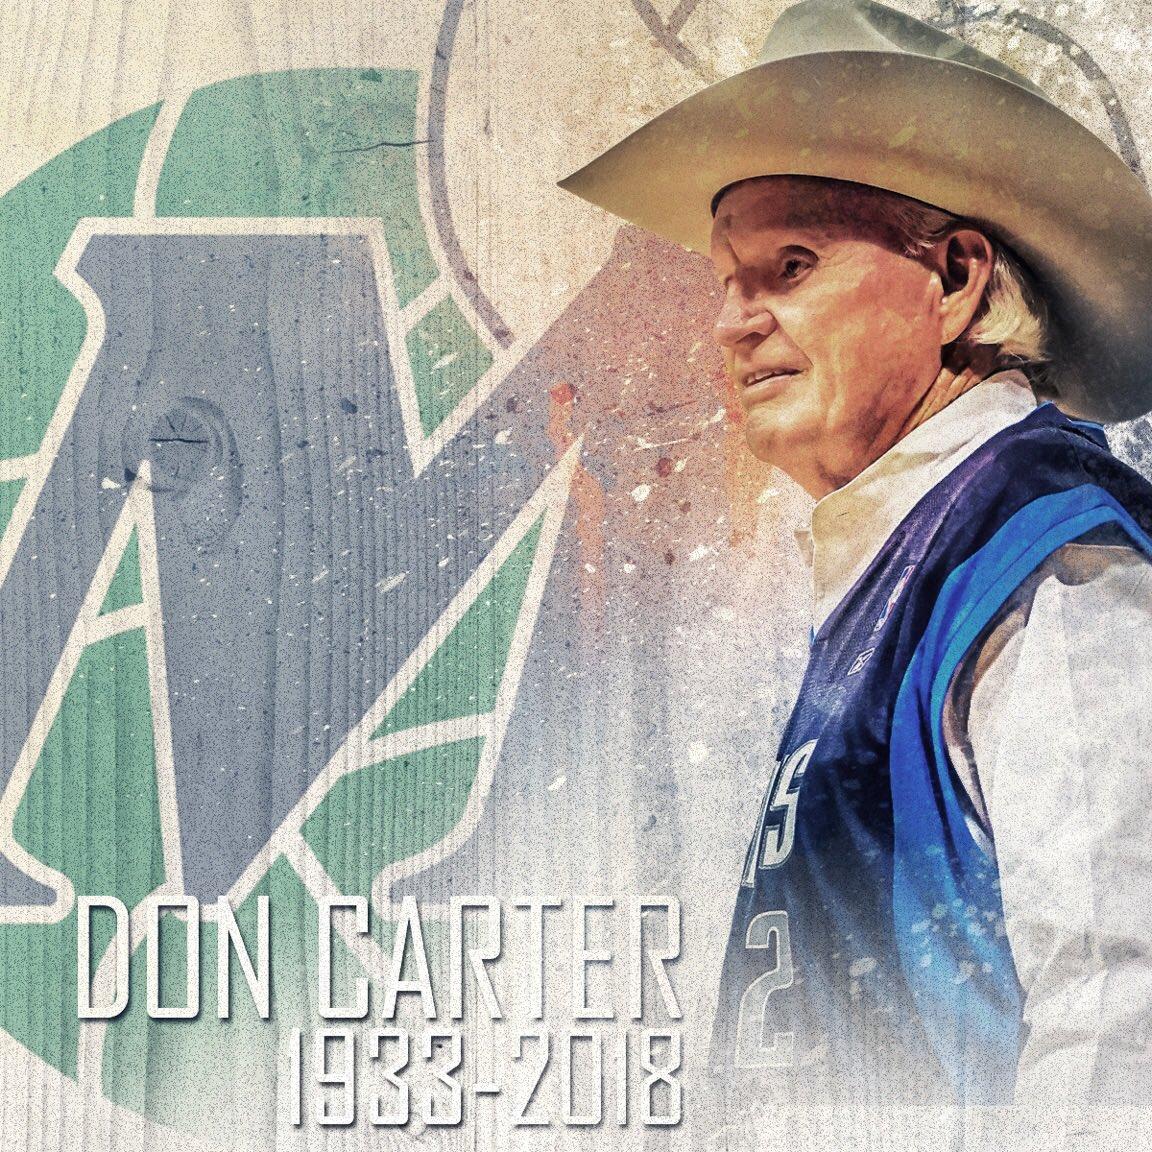 So sad. Legend. RIP